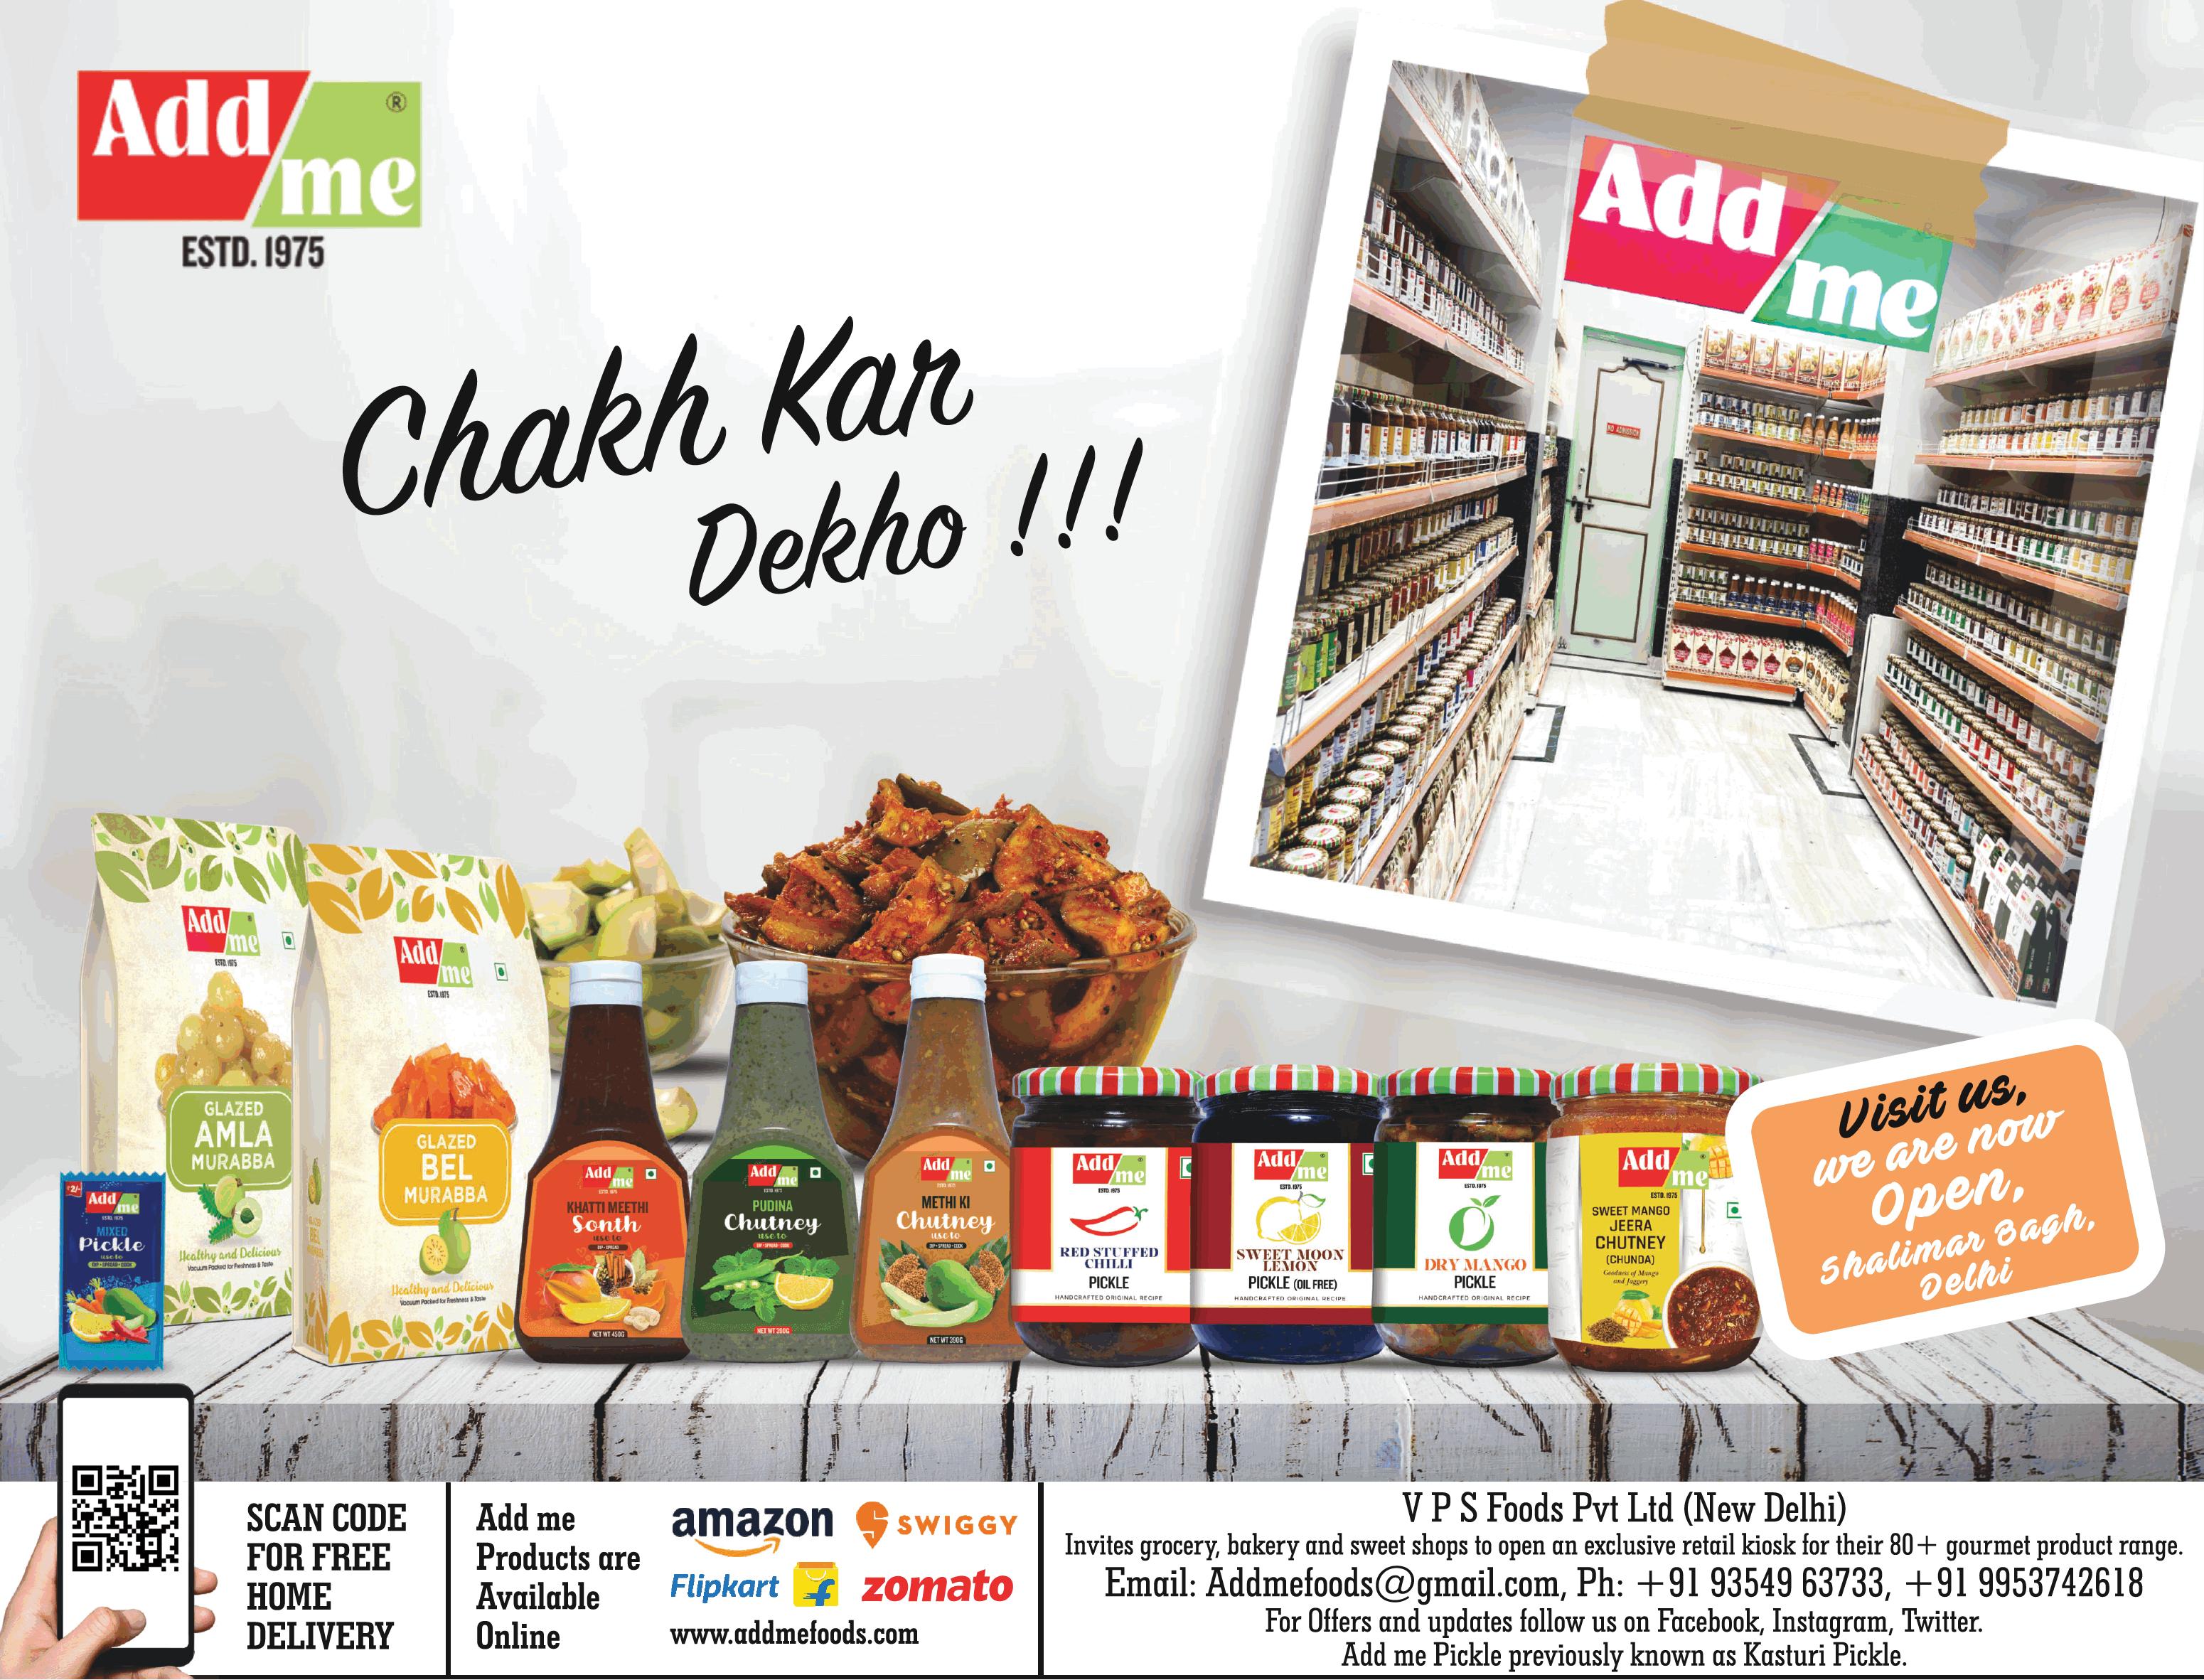 add-me-food-products-chak-kar-dekho-at-shalimar-bagh-ad-toi-delhi-11-7-2021